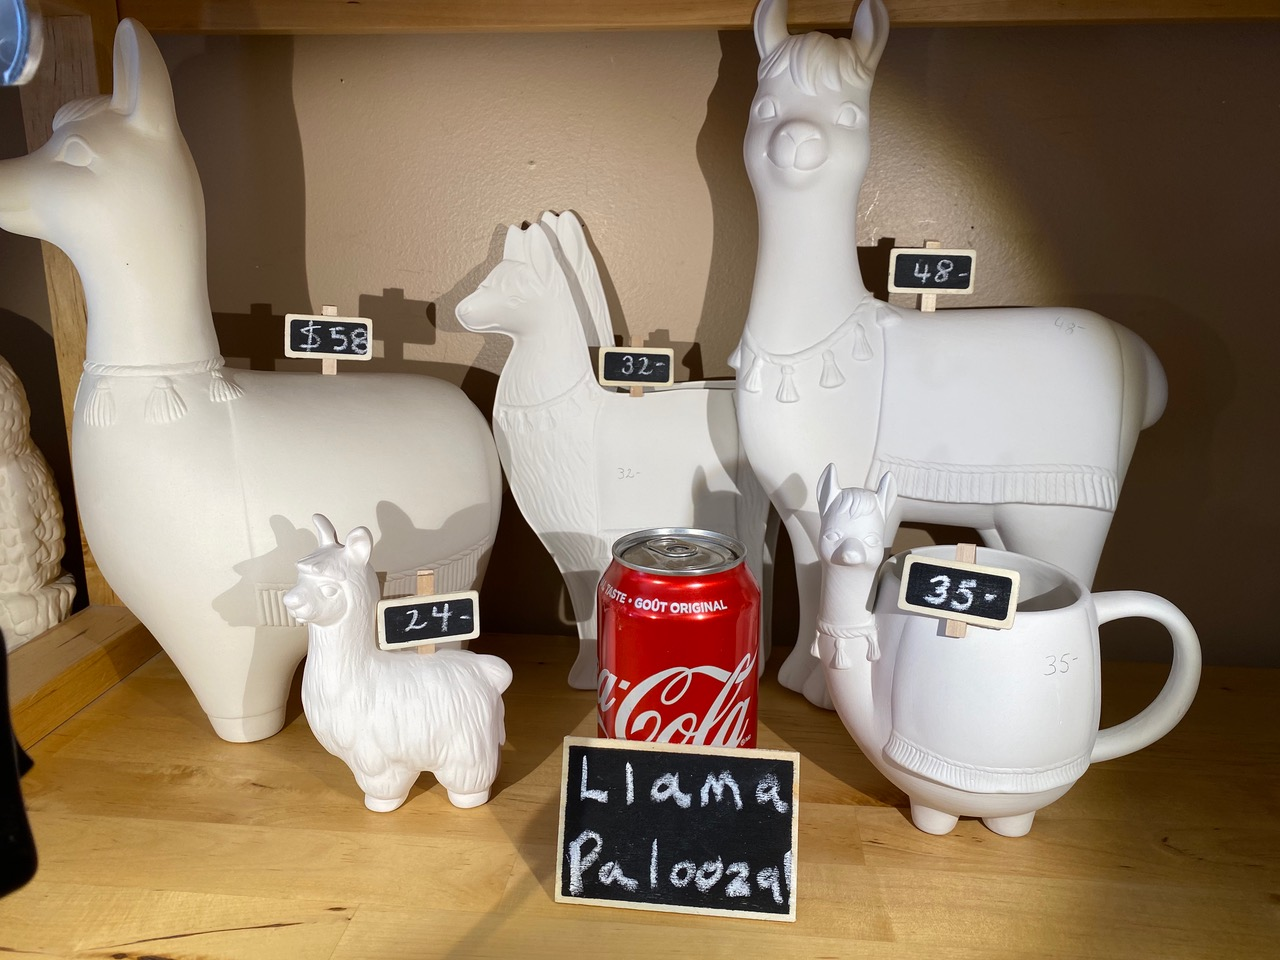 llama collection